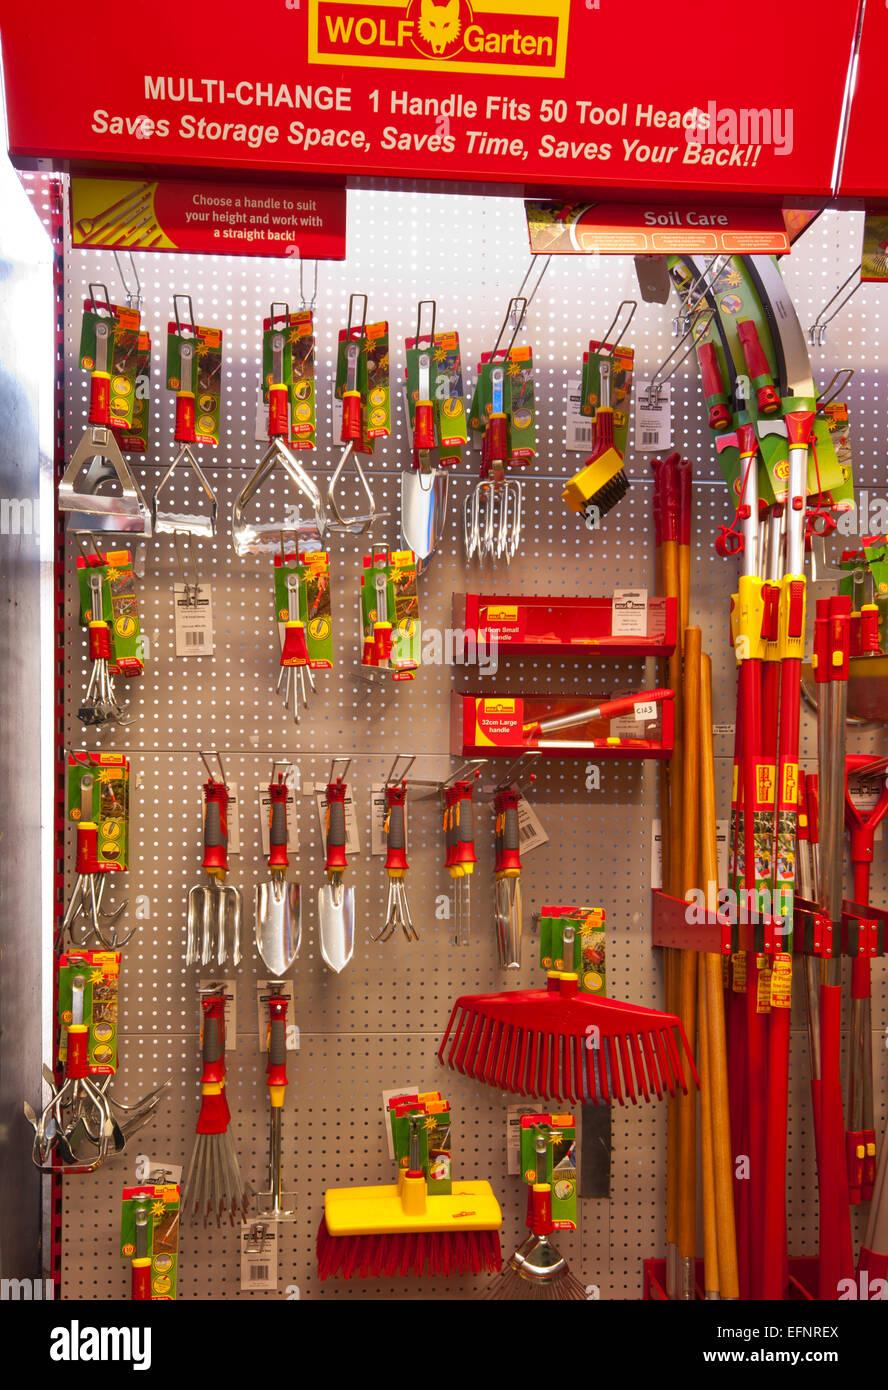 Shop Display Of Wolf Garten Gardening Tools Stock Photo Alamy